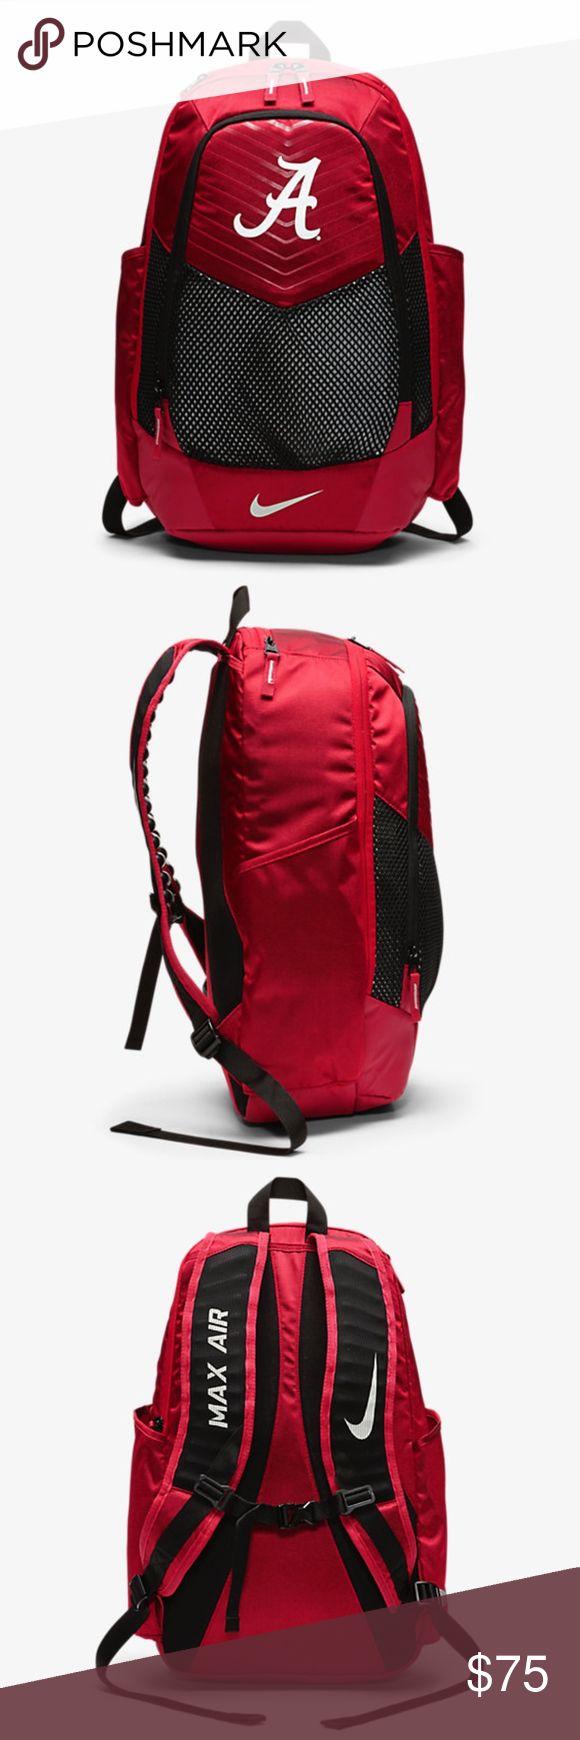 c0aeb4500b8 ALABAMA CRIMSON TIDE - Nike VAPOR POWER Backpack NWT ... NIKE Max Air ...